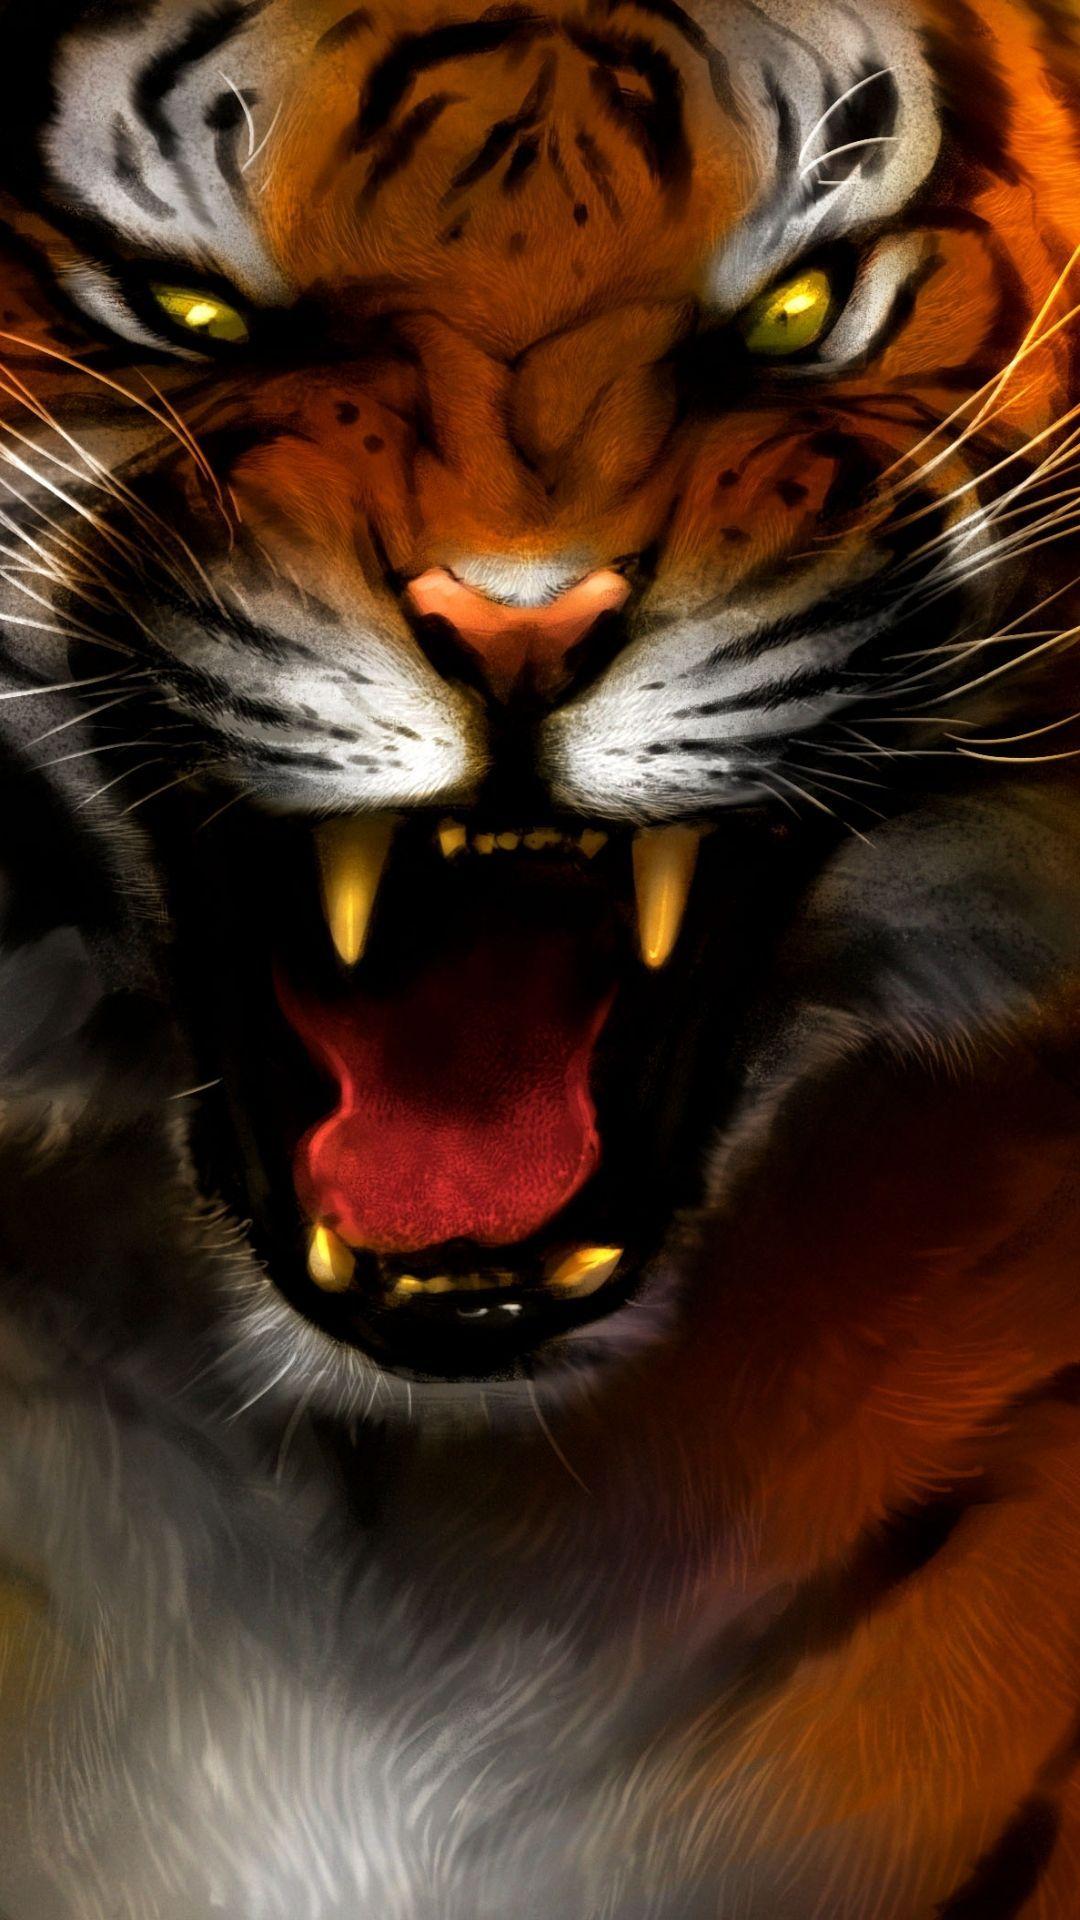 50+ Tiger Phone Wallpapers Download at WallpaperBro